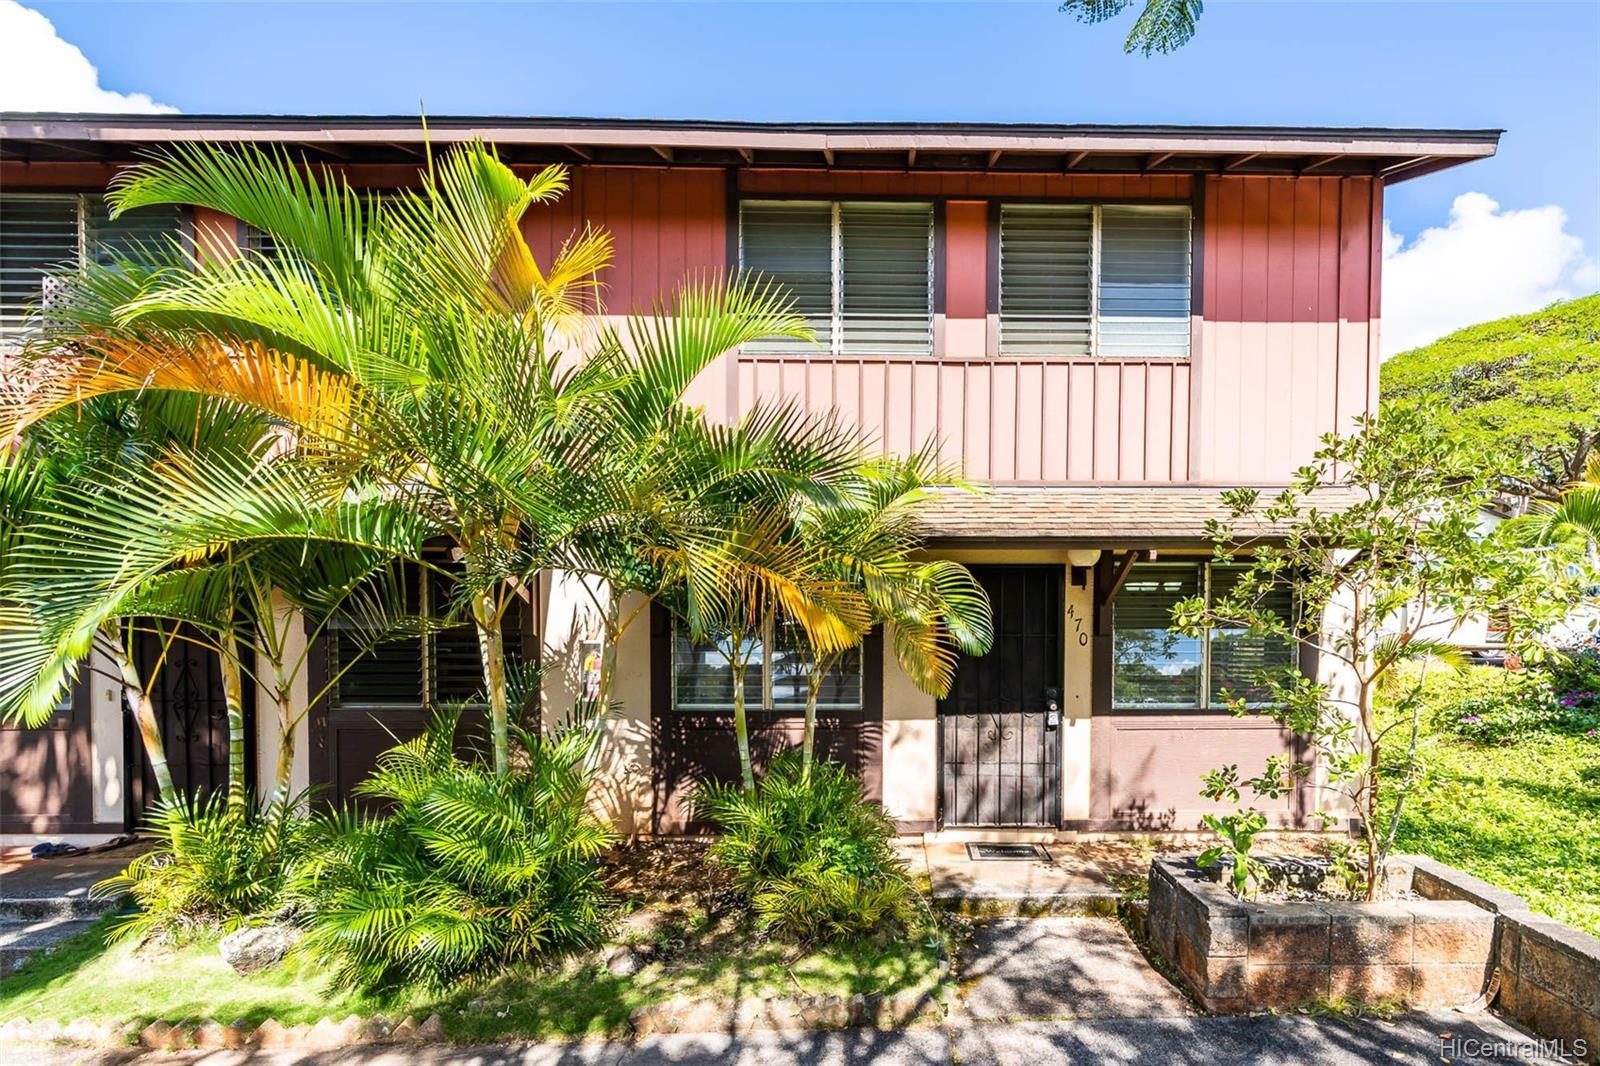 8086237300 townhouse # 470, Mililani, Hawaii - photo 23 of 25